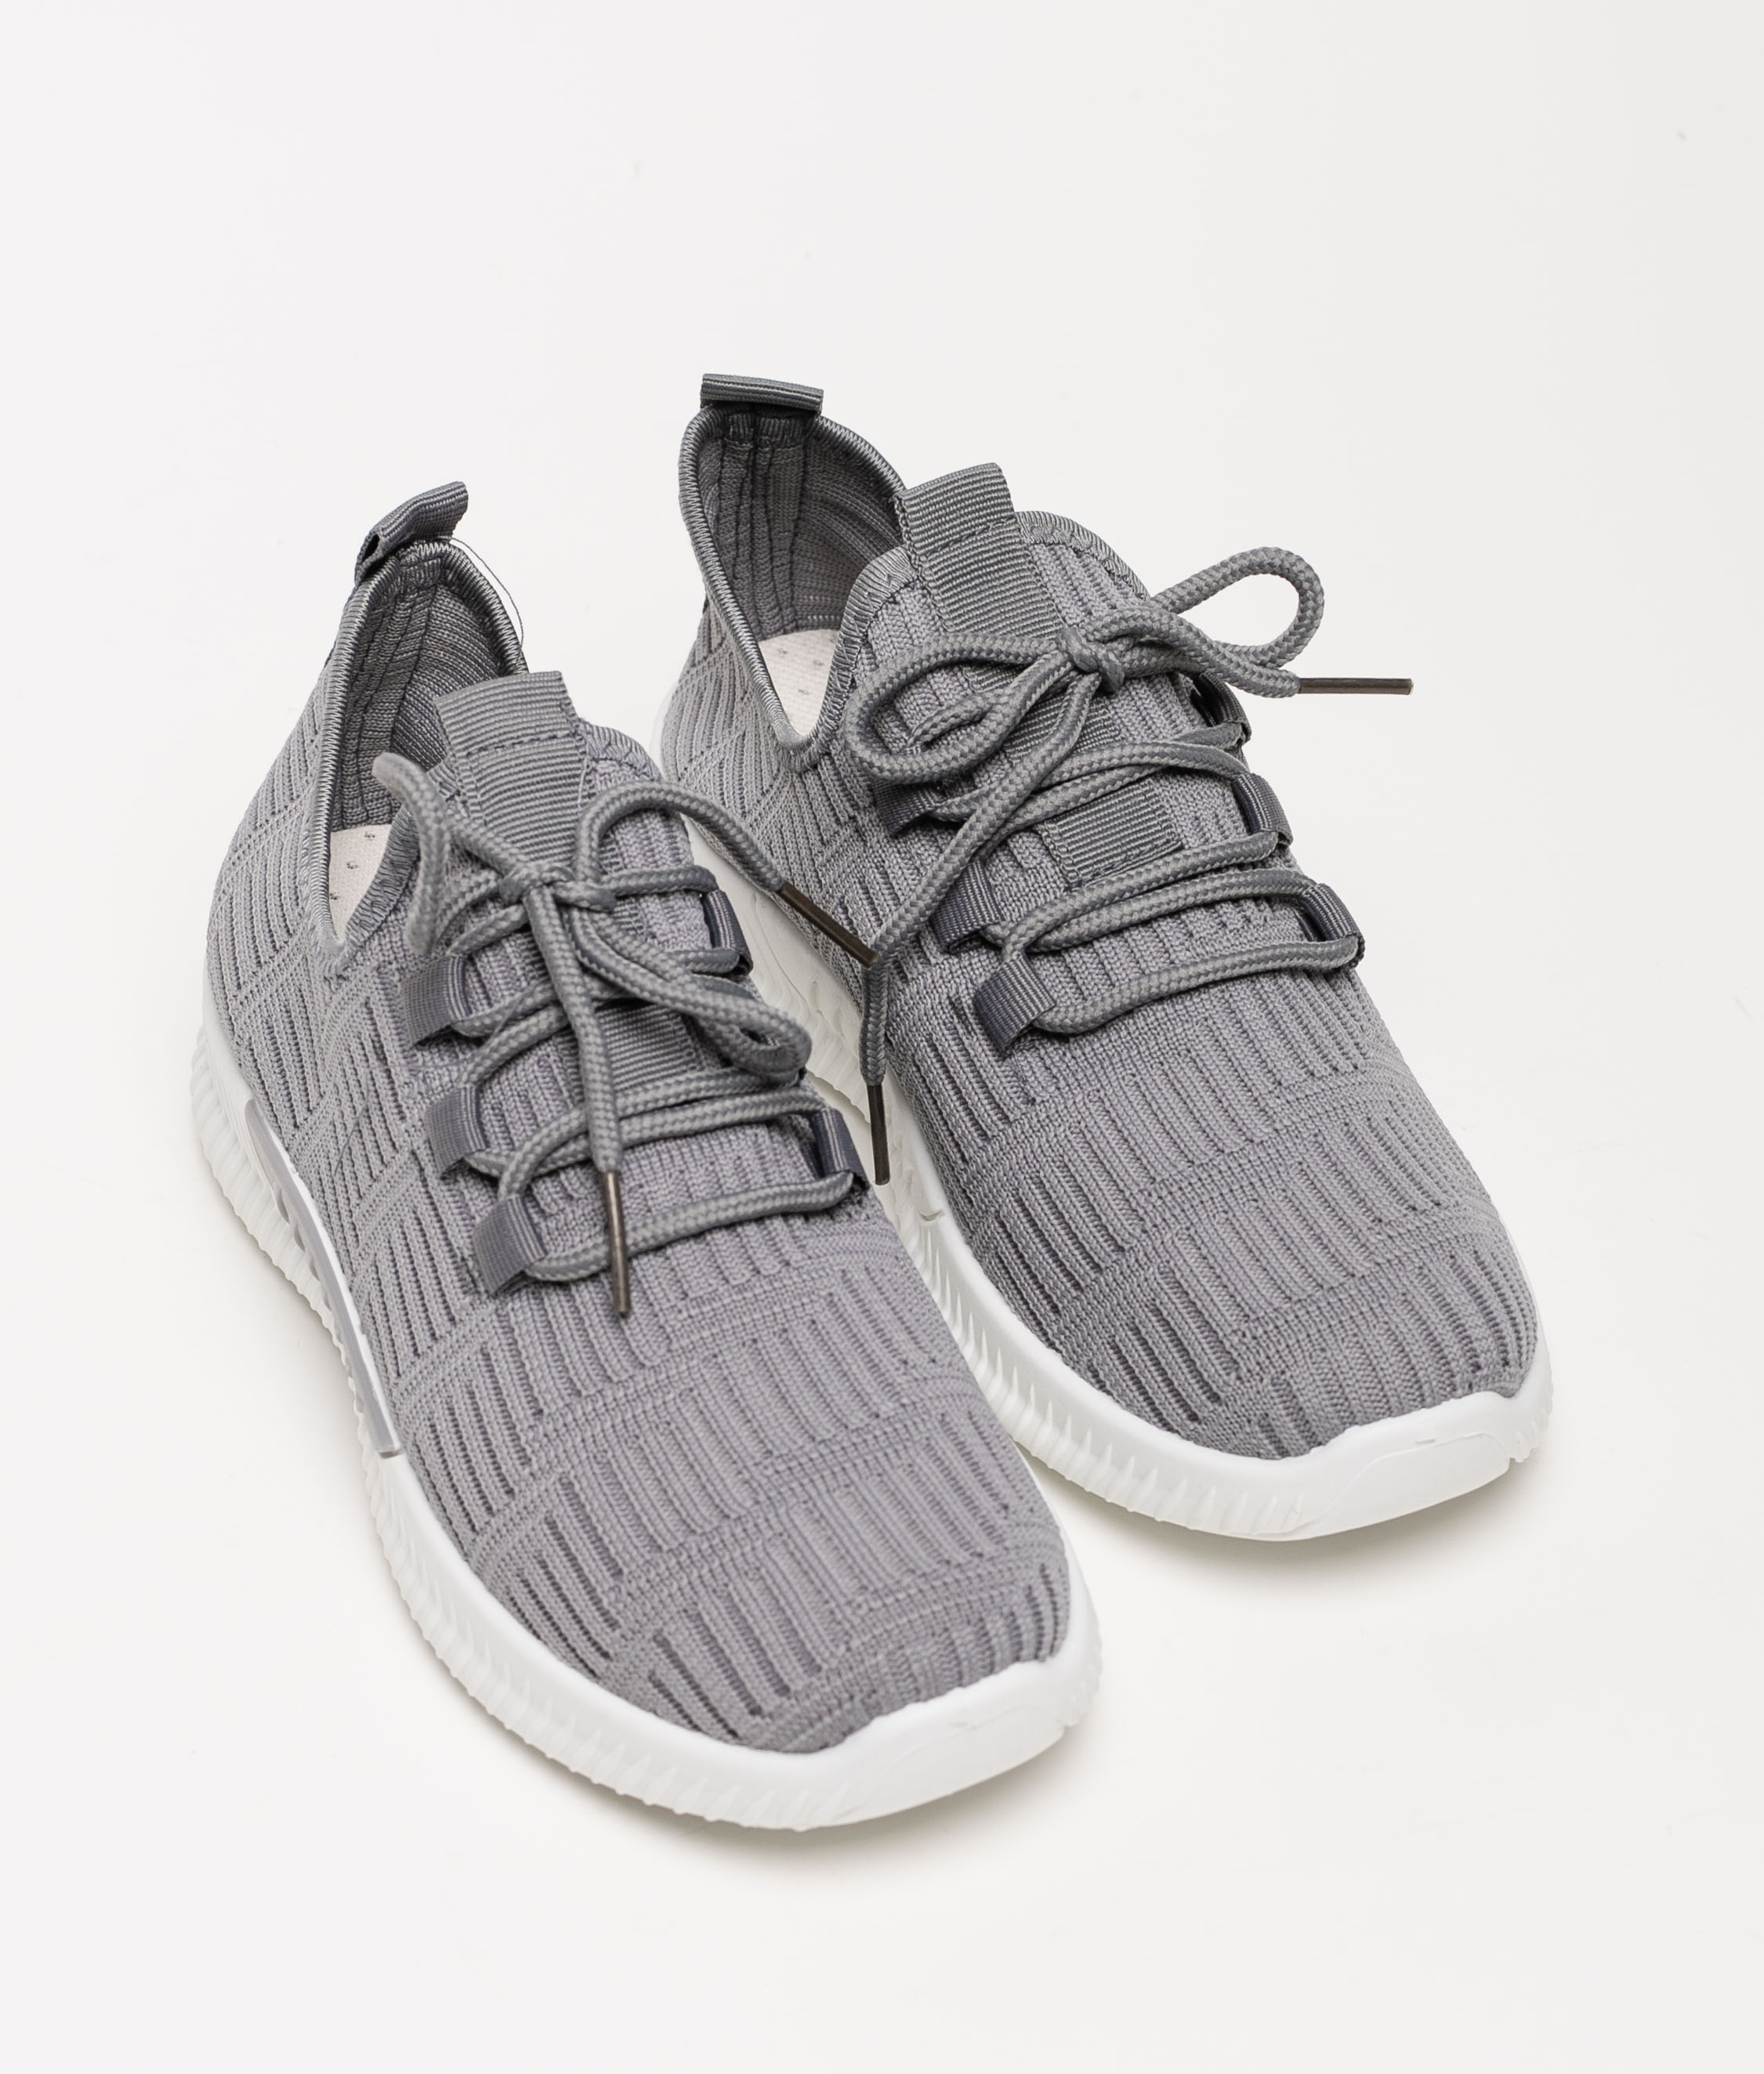 Sneakers Kupir - Gris